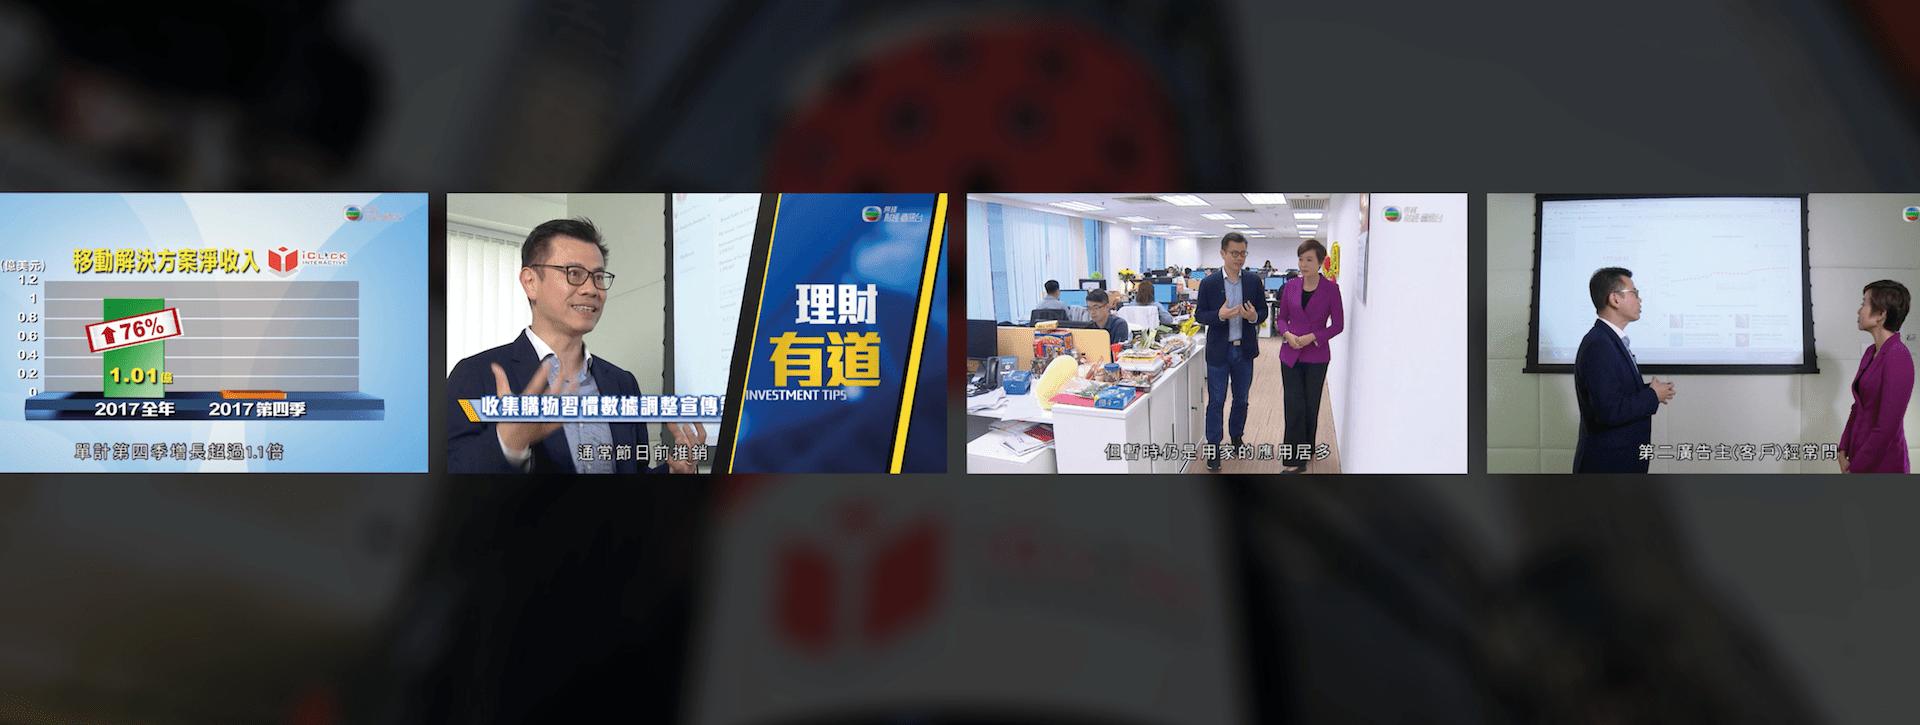 Sammy Hsieh @ TVB Investment Tips